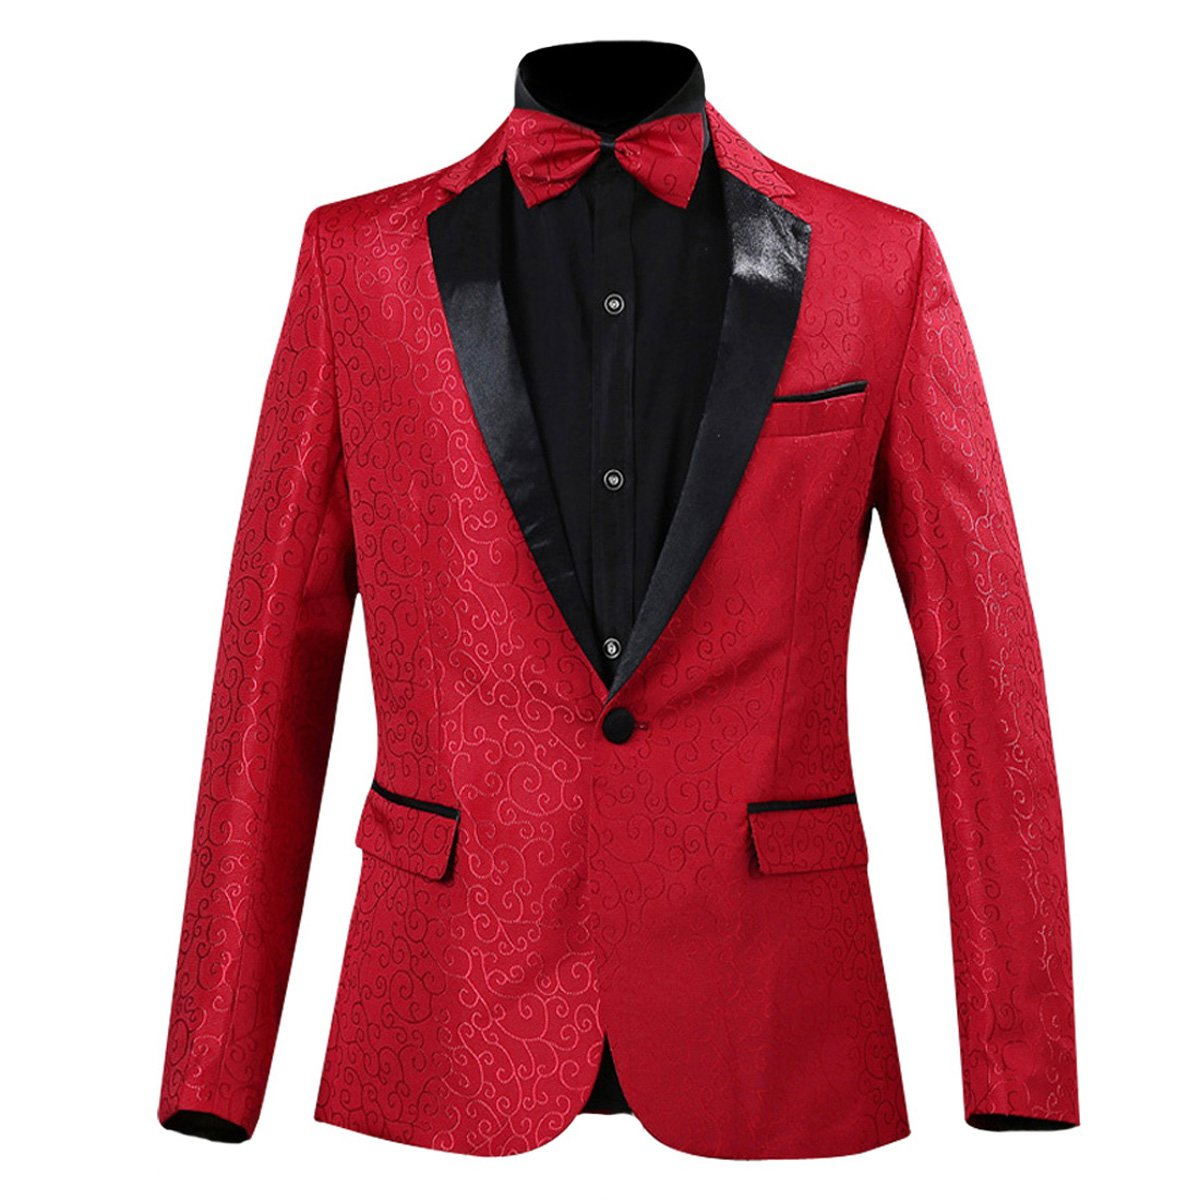 PYJTRL Men's Fashion Slim Fit Floral Jacquard Suit Jacket (Red, Tag M/US 36R) by PYJTRL